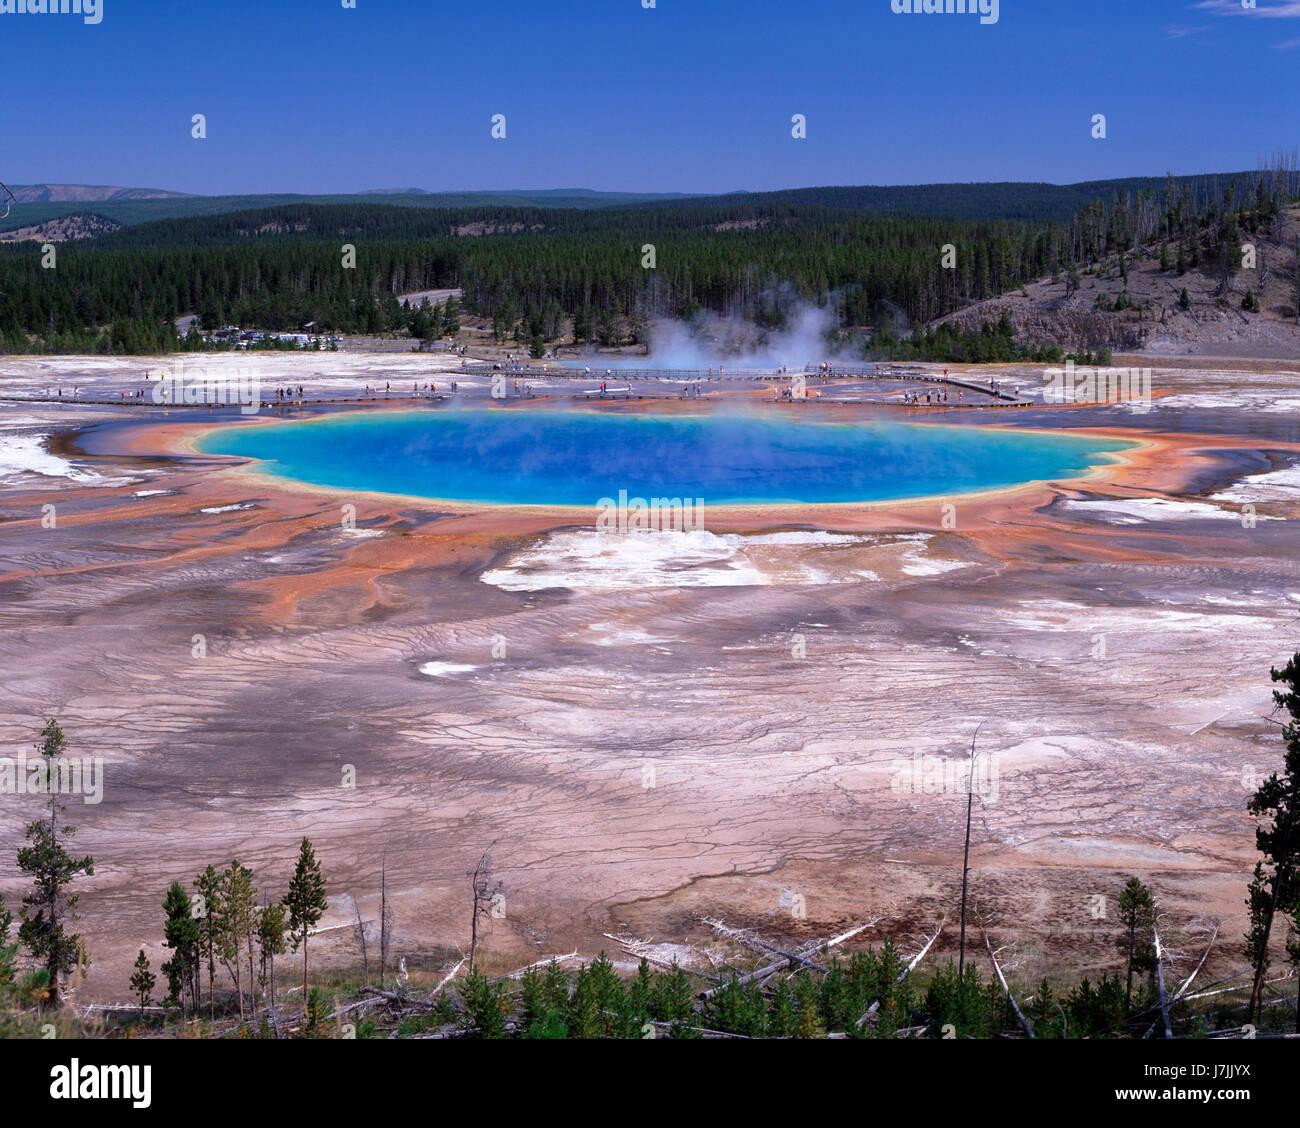 Grand Prismatic Pool, Yellowstone National Park, Wyoming, USA - Stock Image